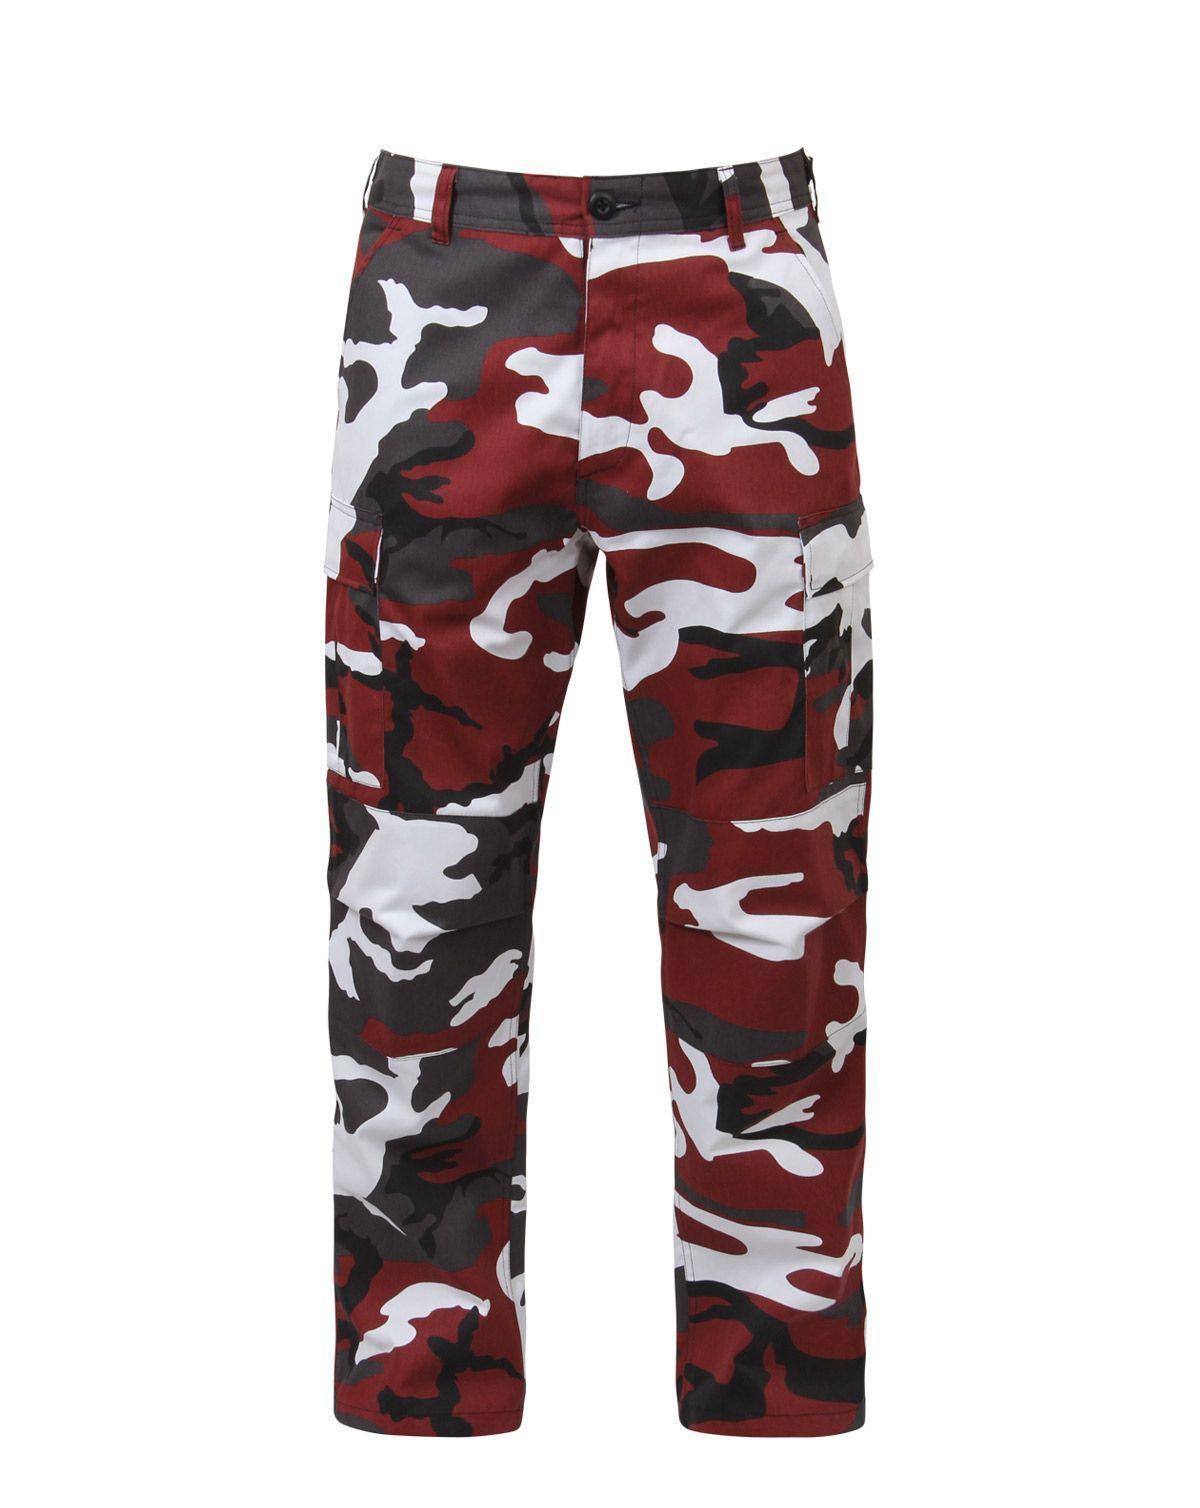 Buy Rothco BDU Pants | Money Back Guarantee | ARMY STAR